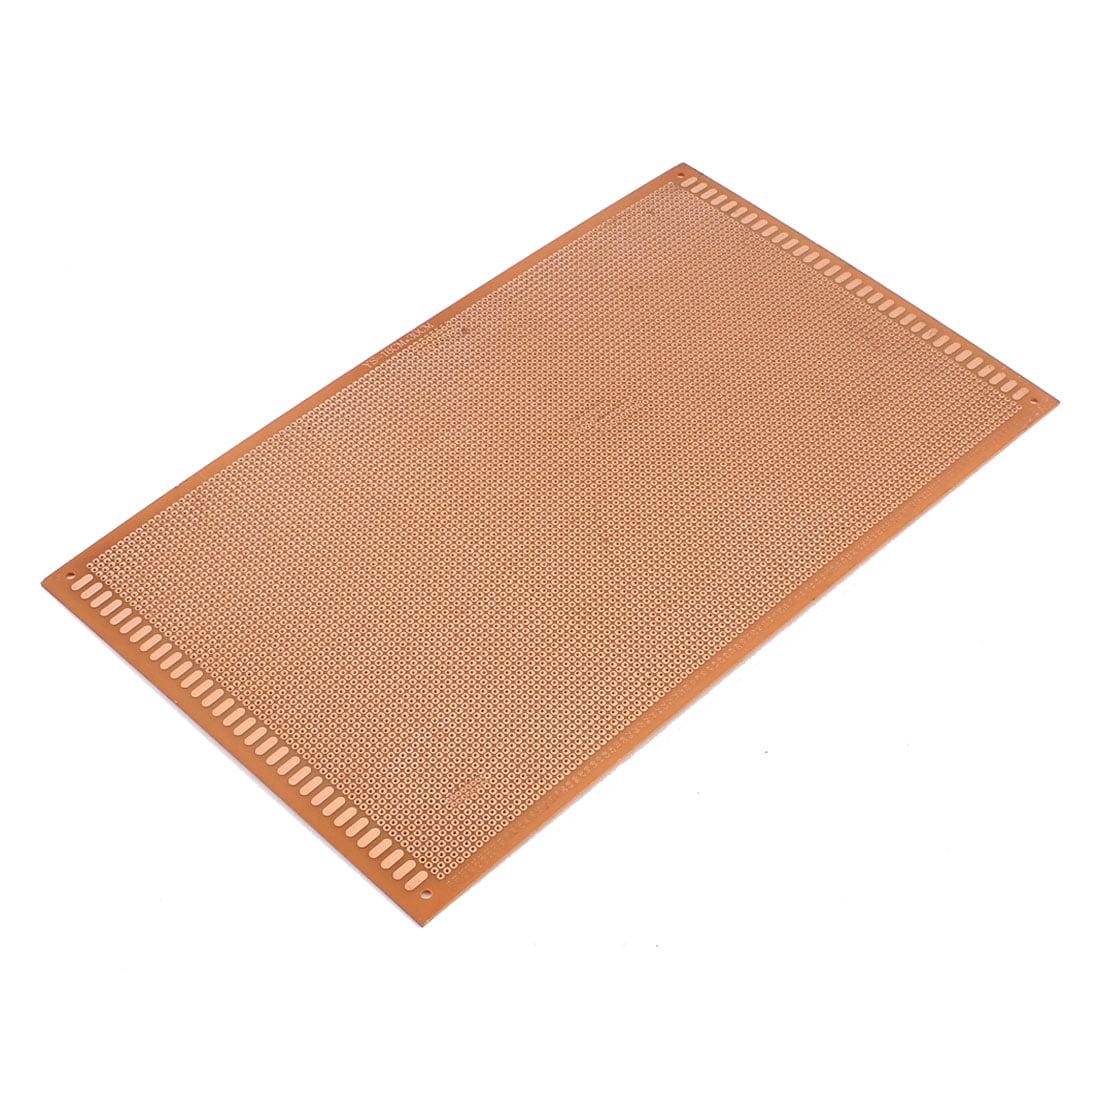 30cm x 18cm DIY Single Side Prototype Matrix Universal PCB Printed Circuit Board